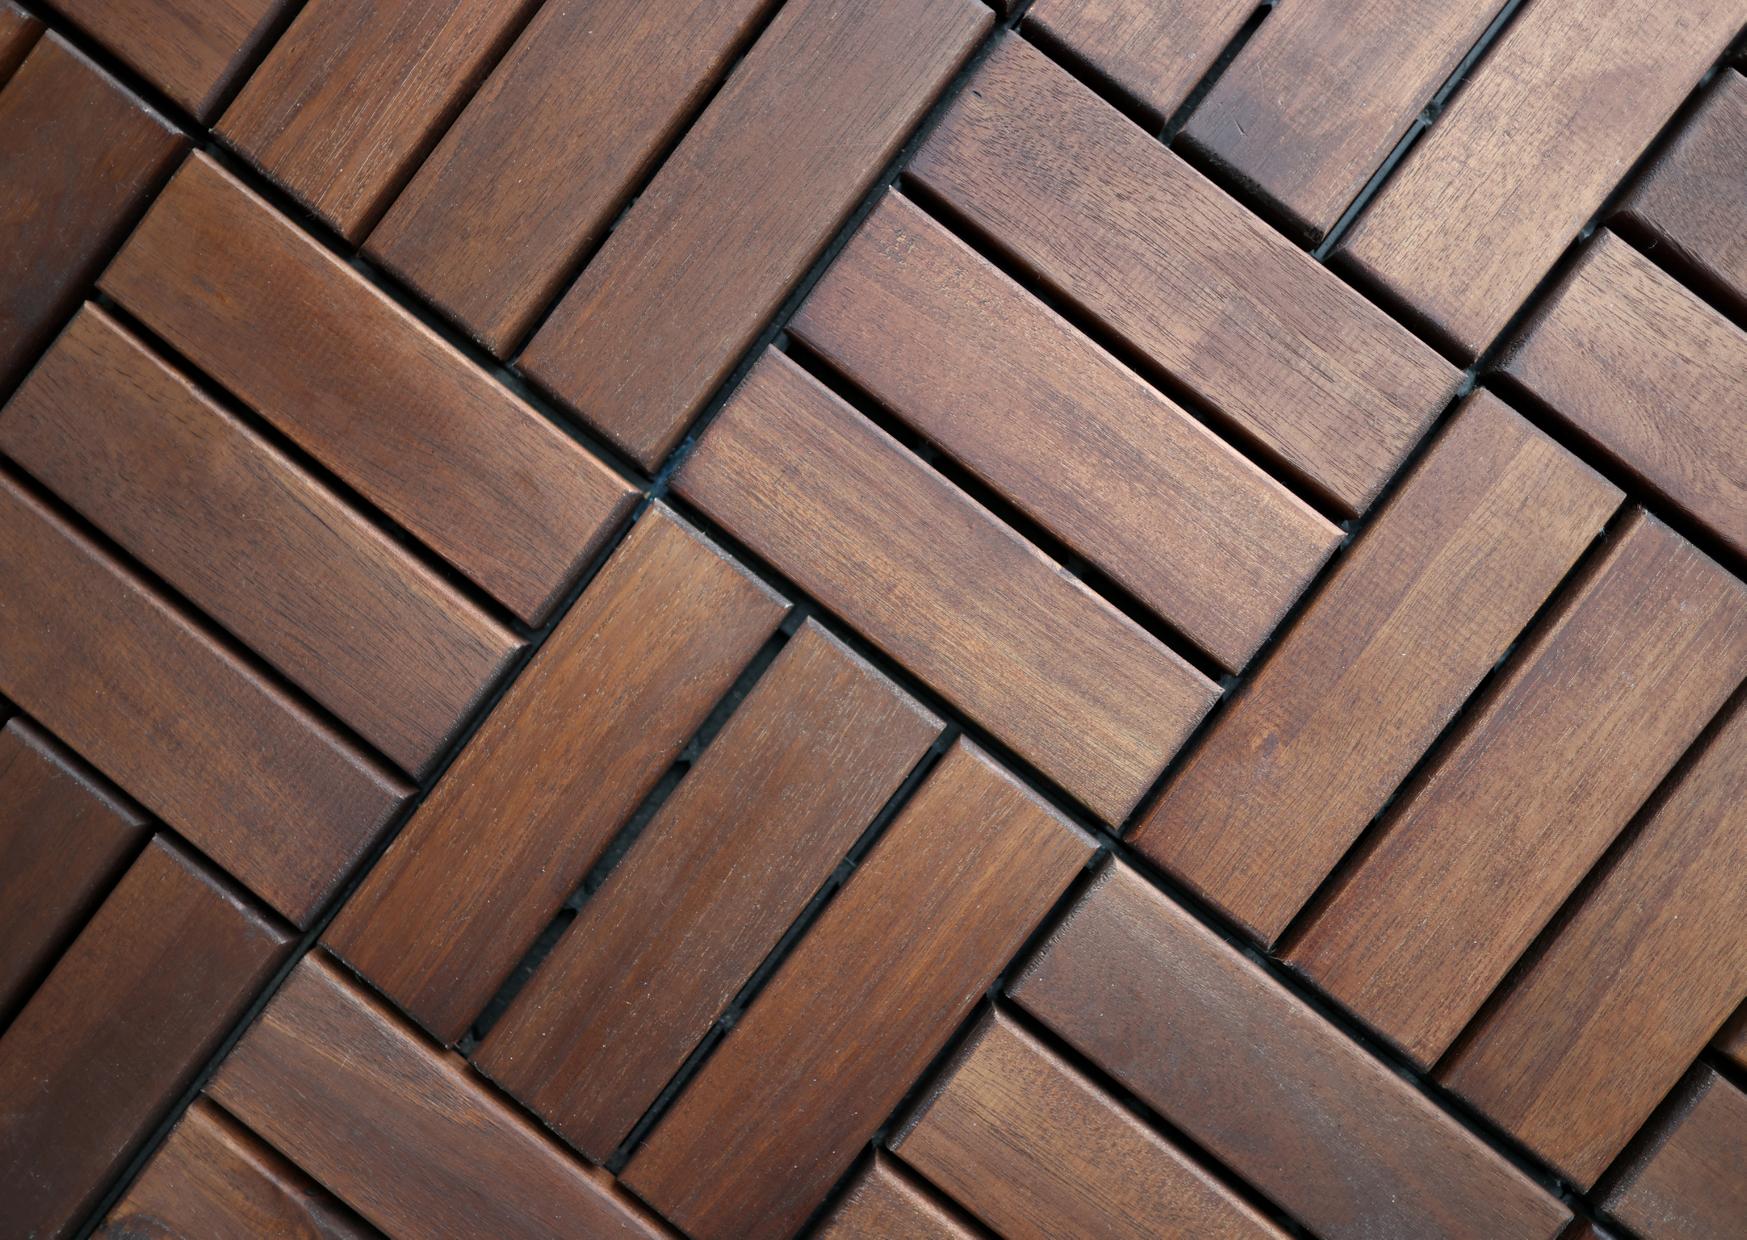 Photo of Deck Tiles